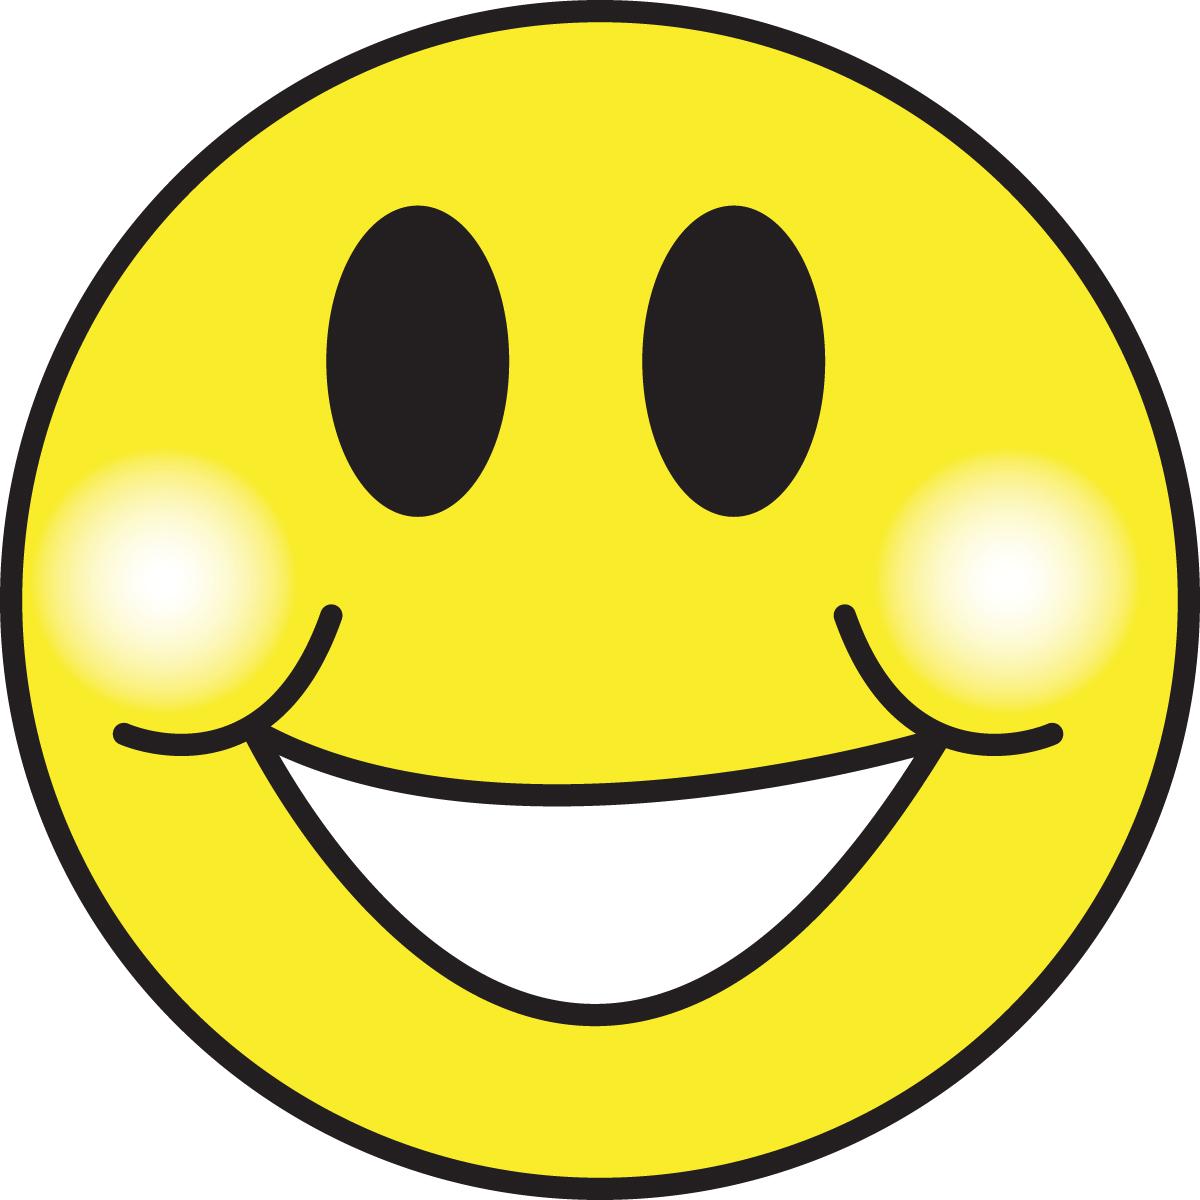 smiley face clip art emotions-smiley face clip art emotions-4